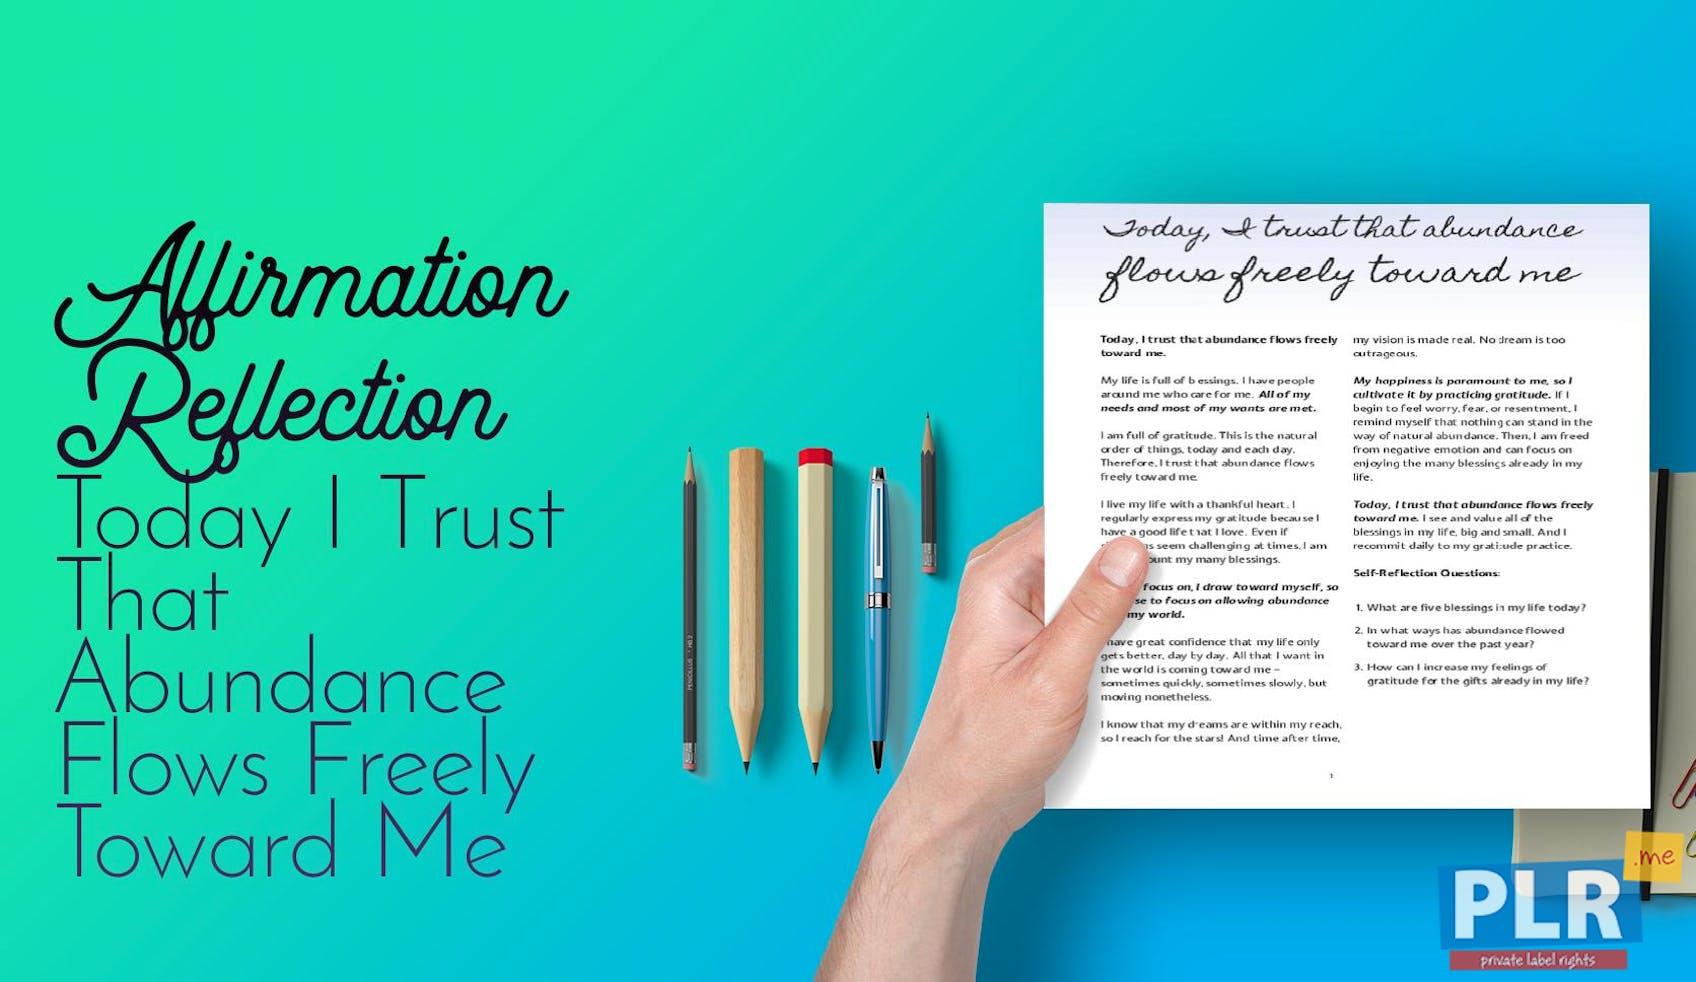 Today I Trust That Abundance Flows Freely Toward Me